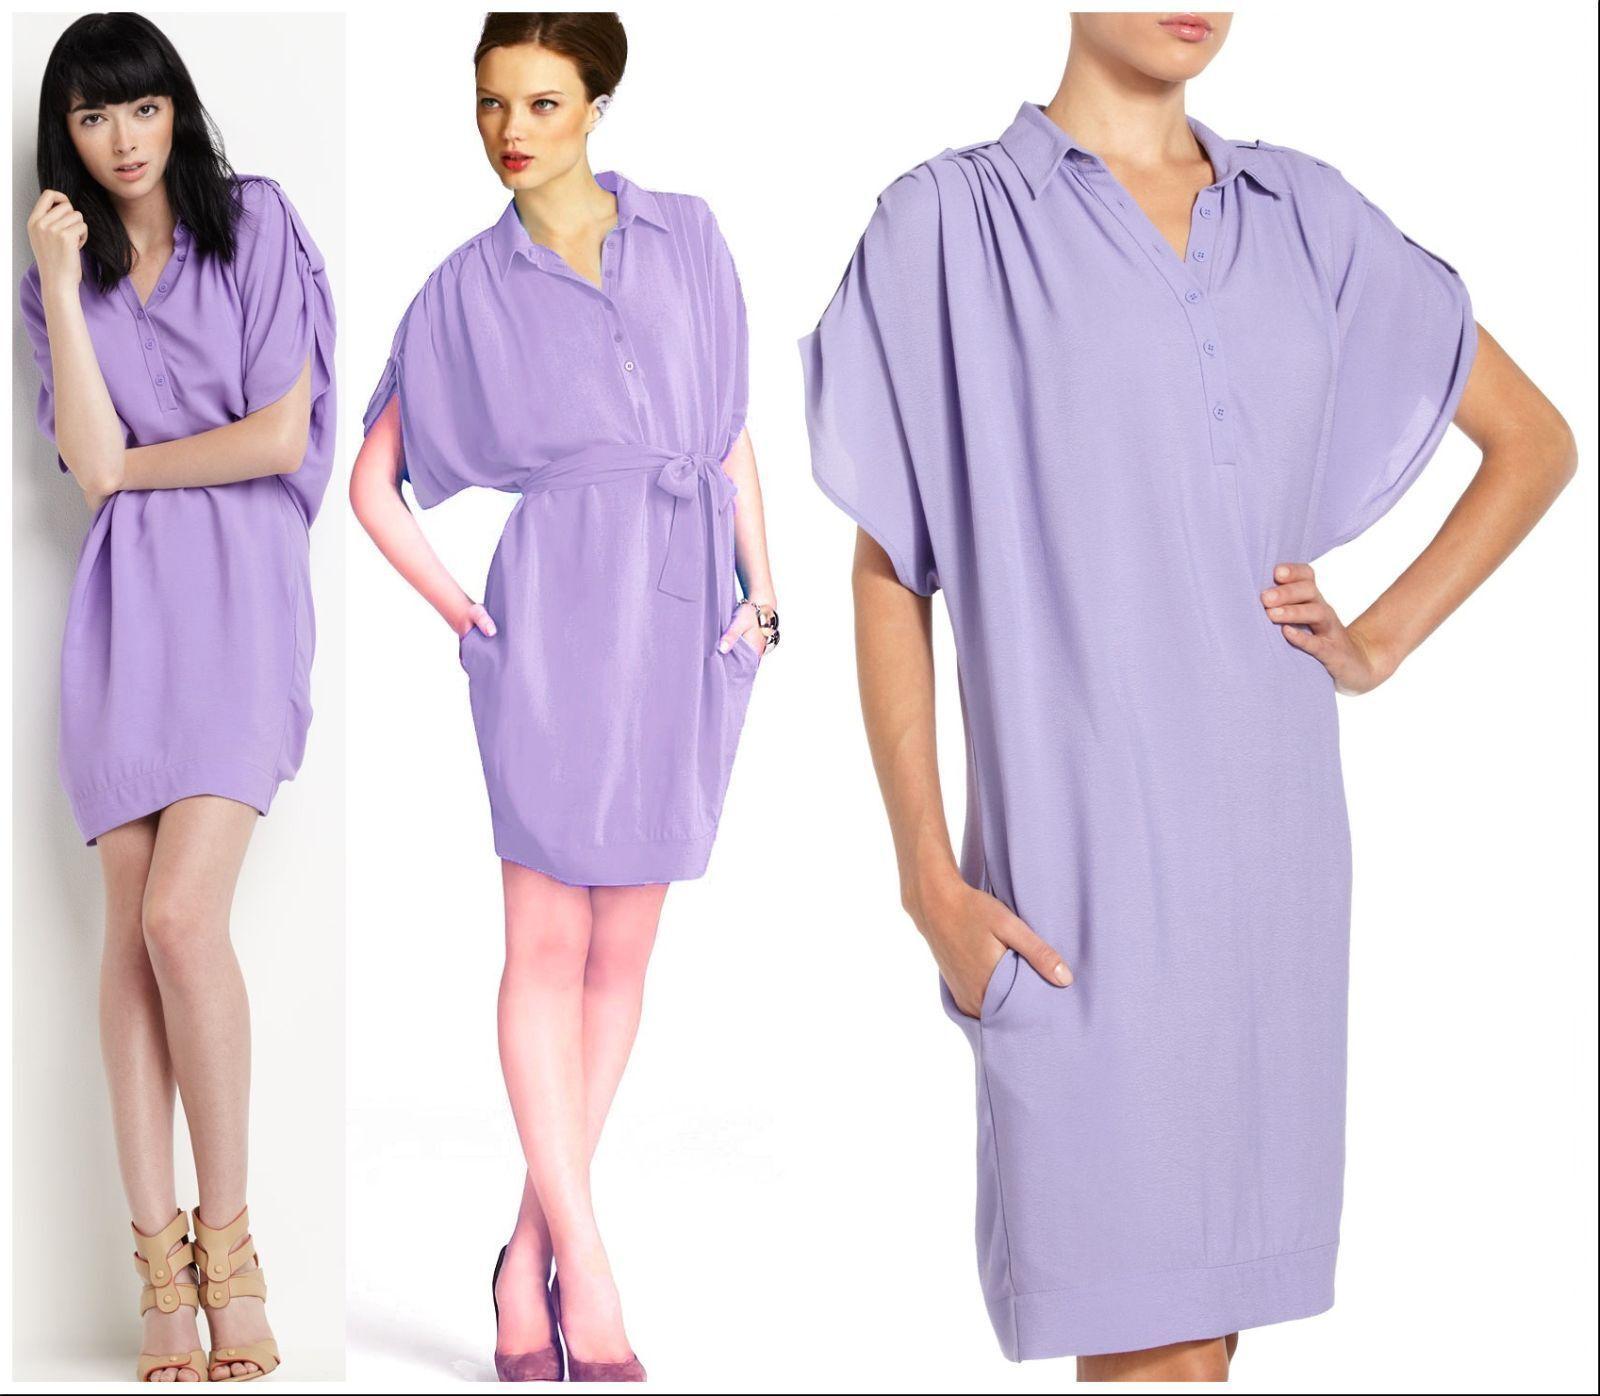 365 Diane Von Furstenberg DVF Freesia Karin Crepe Belted Shirt Dress 4